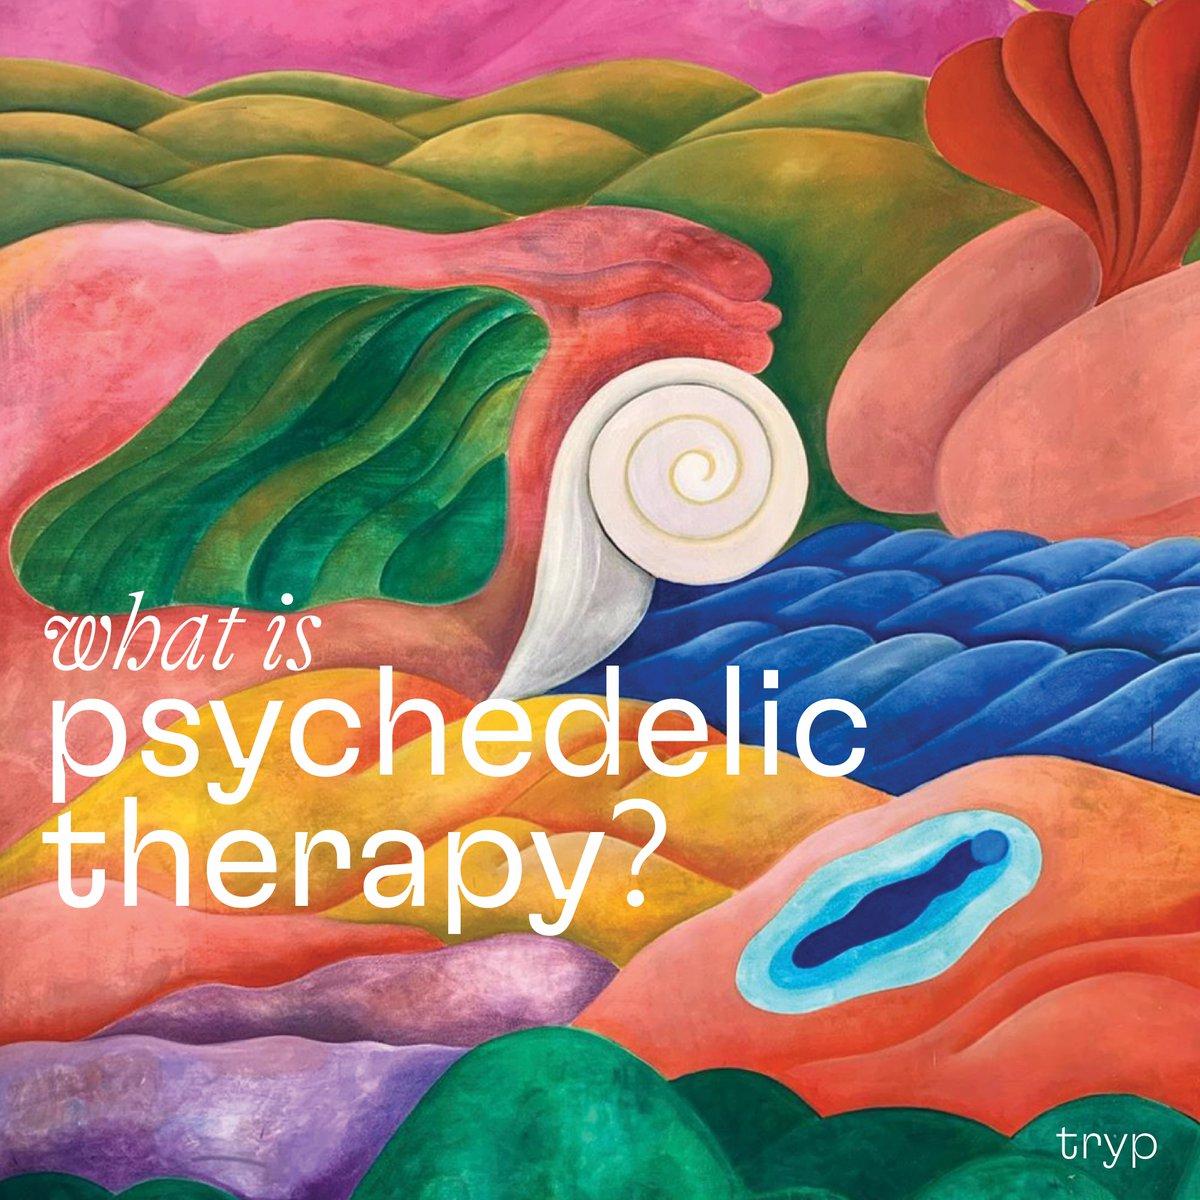 Terapi TRP Dapat Mengatasi Fibromyalgia Dengan Penggunaan Psilocybin